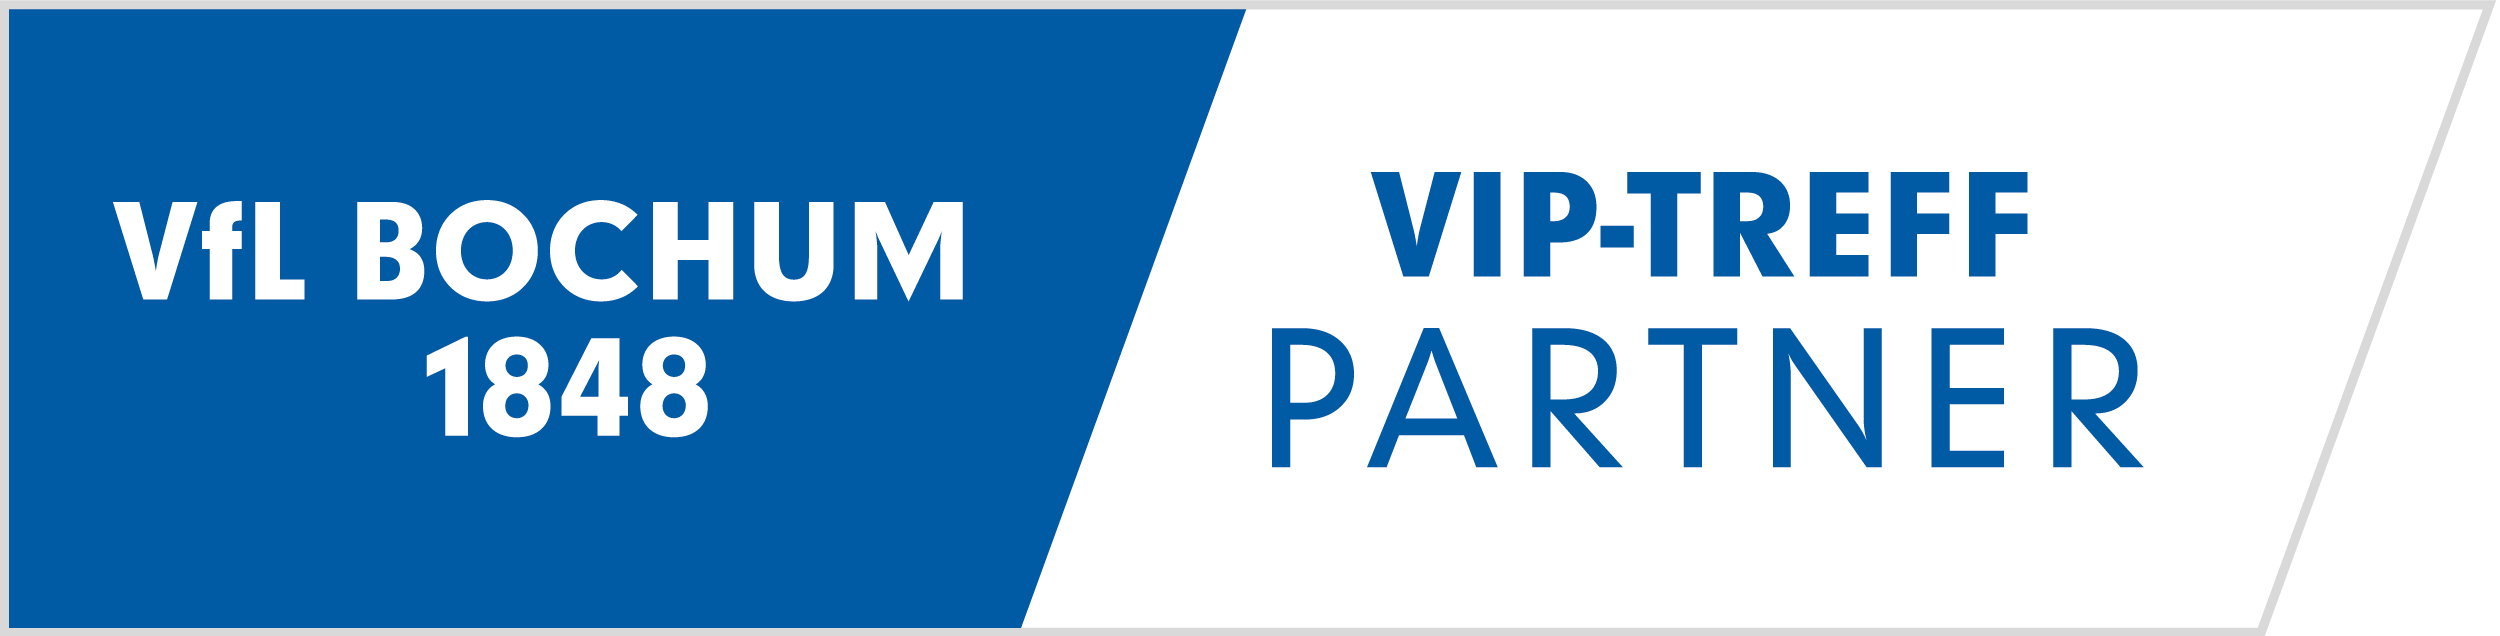 Logo VfL Bochum - VIP-Treff Partner